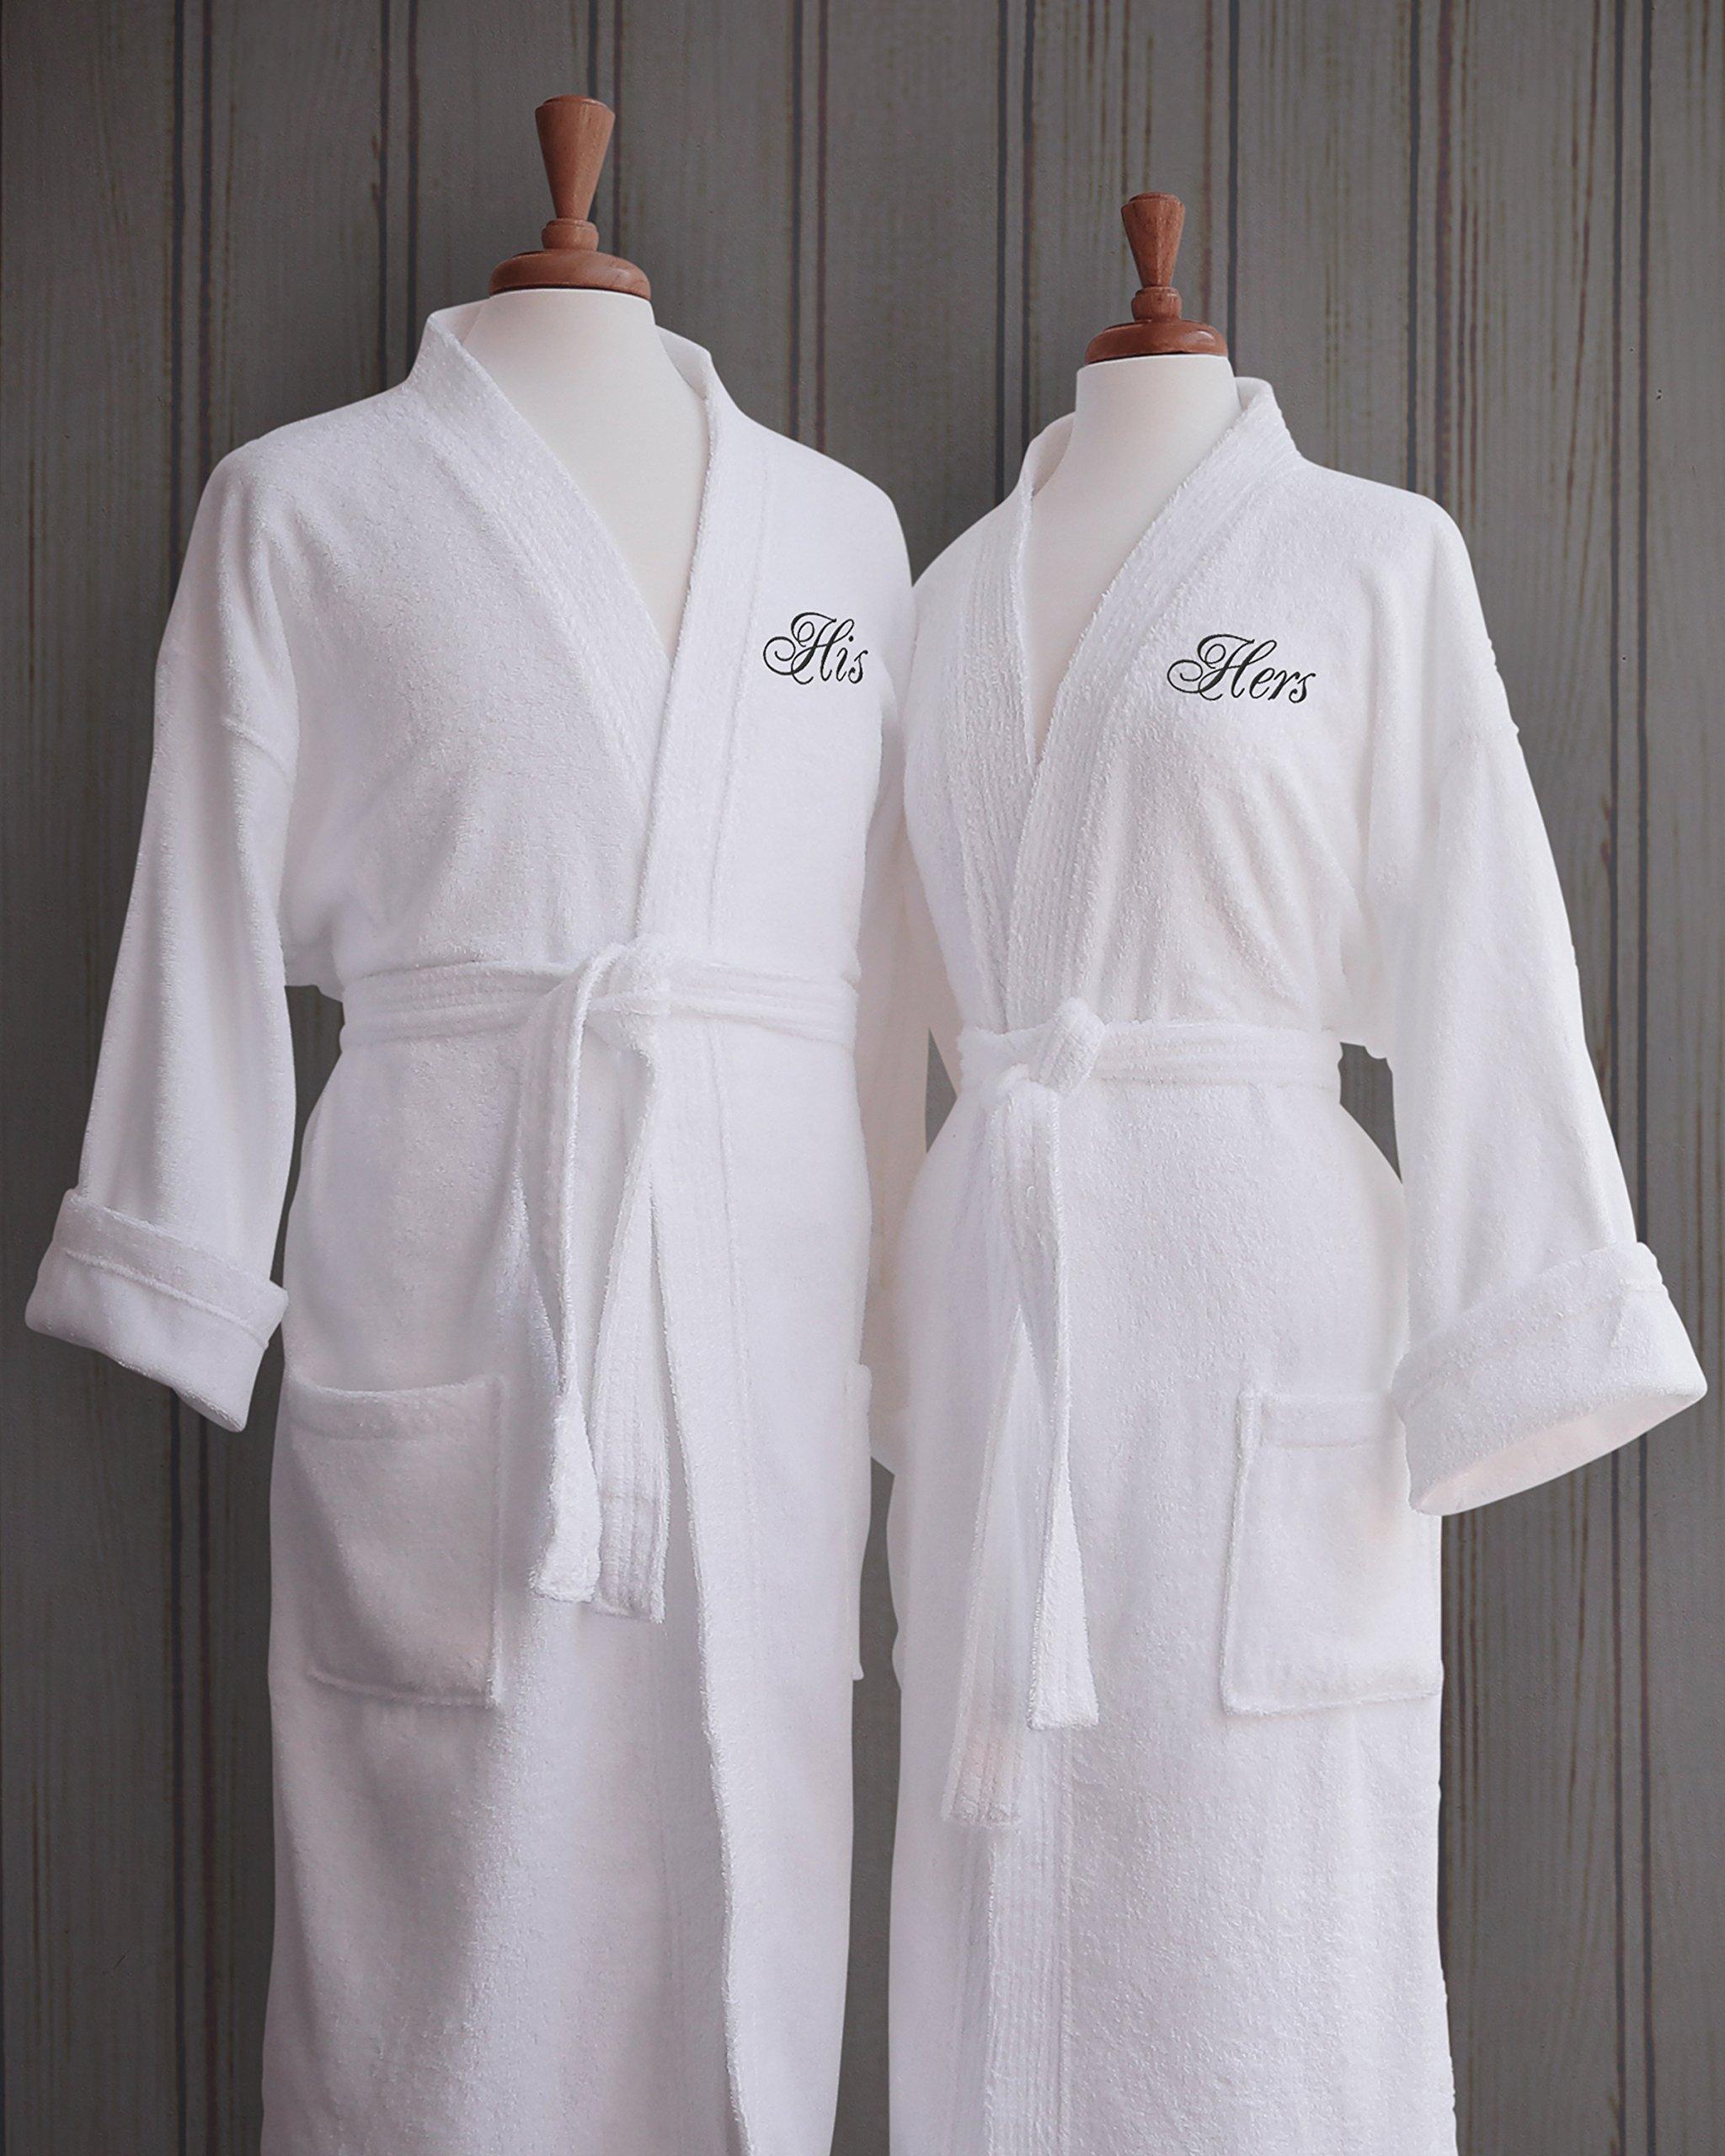 Luxor Linens - Terry Cloth Bathrobes - 100% Egyptian Cotton His   Her  Bathrobe Set 03b5d4edd